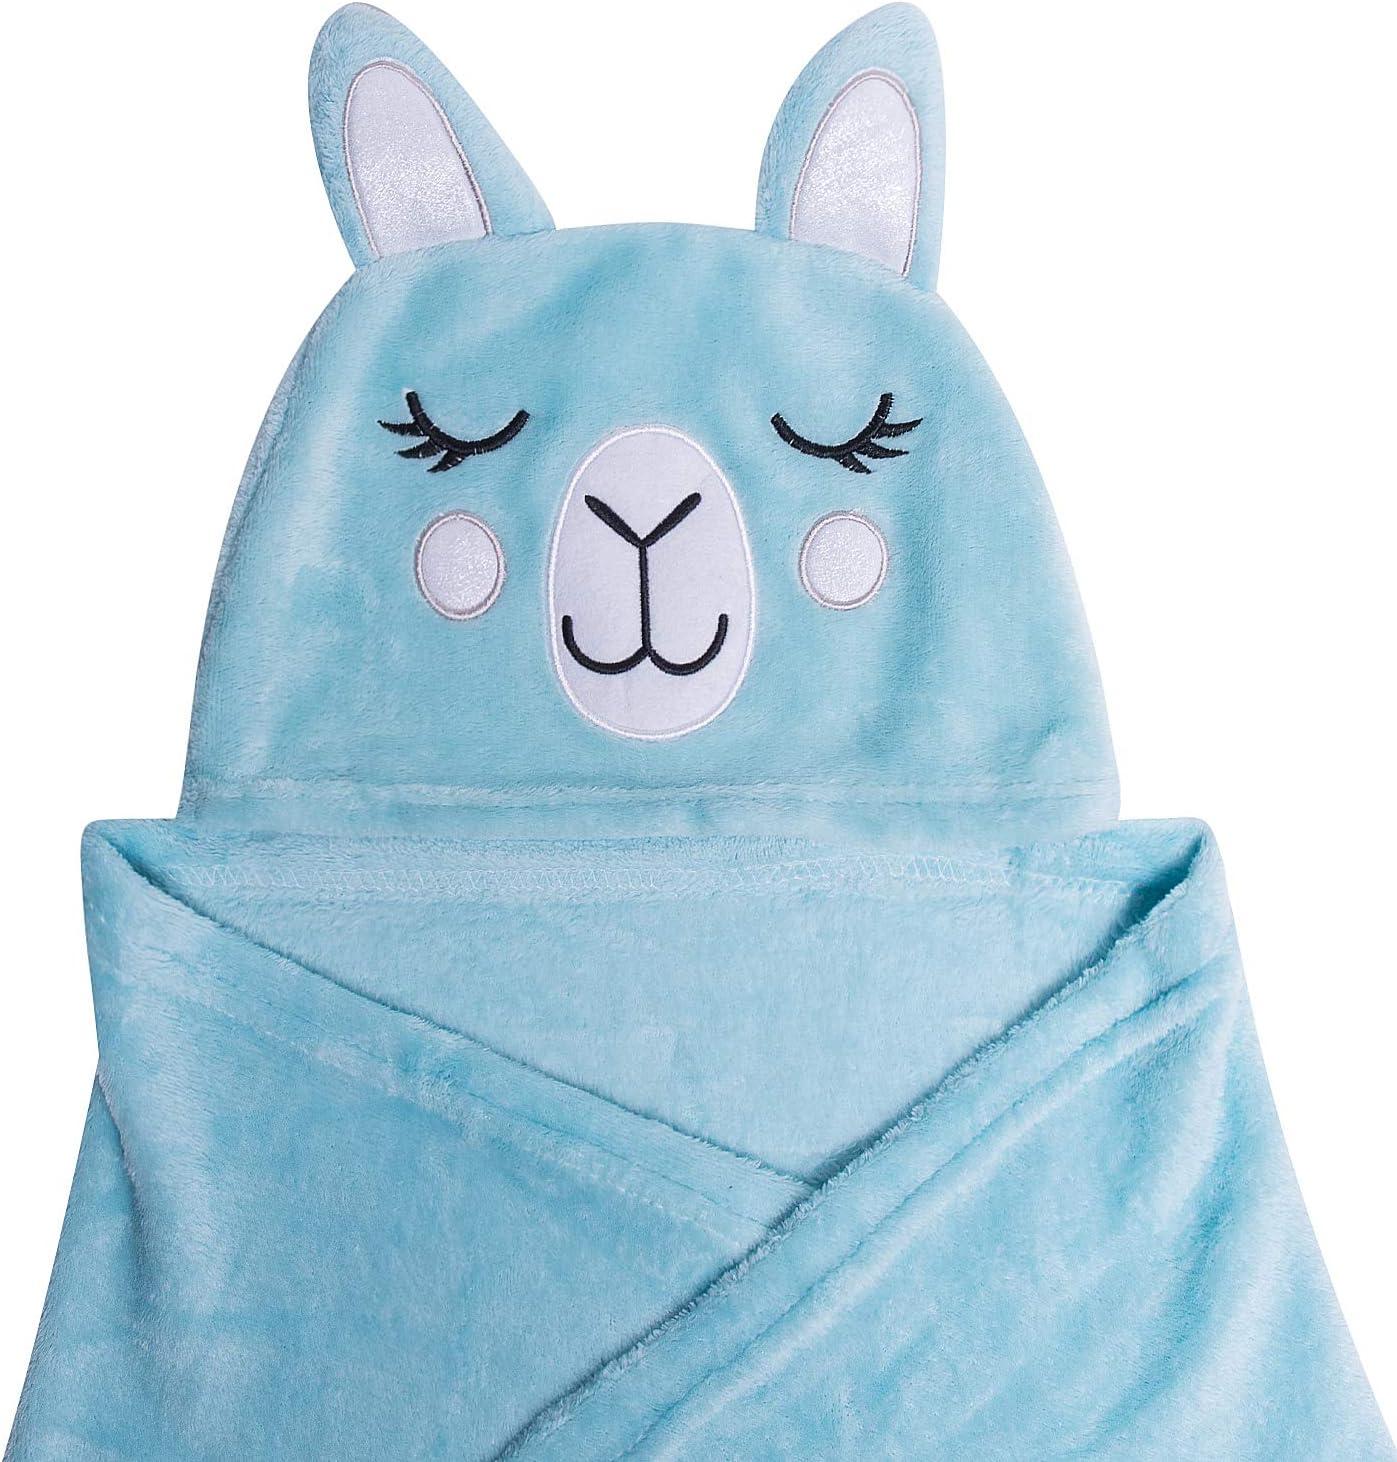 Blanket Hoodie for Kids - Large Hooded Blanket Wearable Animal Throw Unicorn Blanket for Kids - Throw Blankets with Hood - Hoodie Blankets for Kids - Throw Blankets with Hood (Llama Blanket)